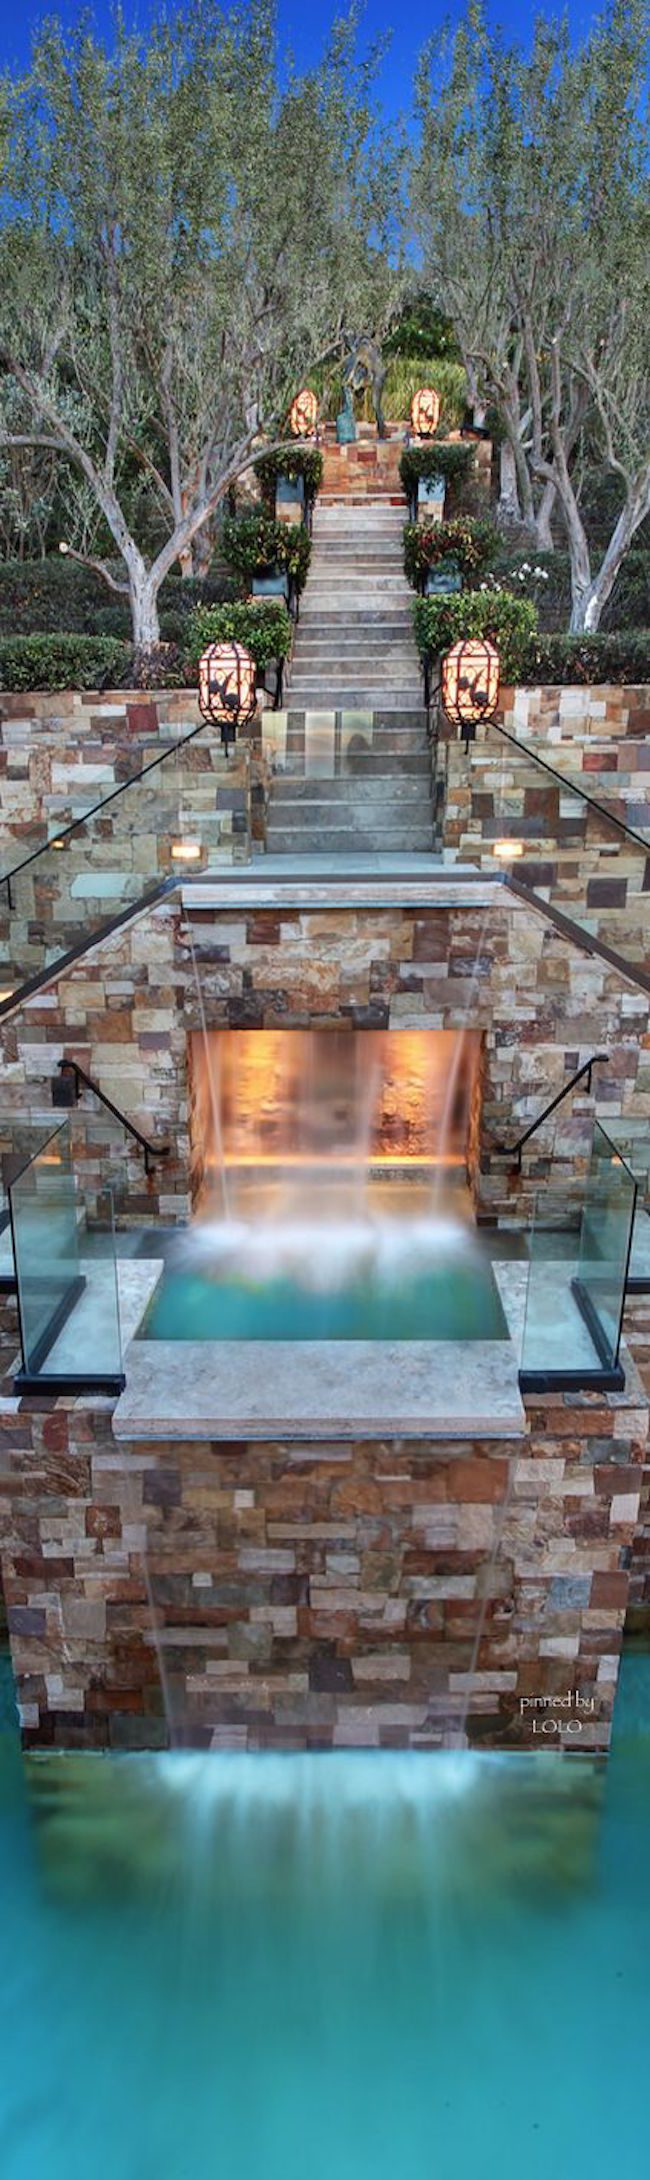 piscinas_magníficas16